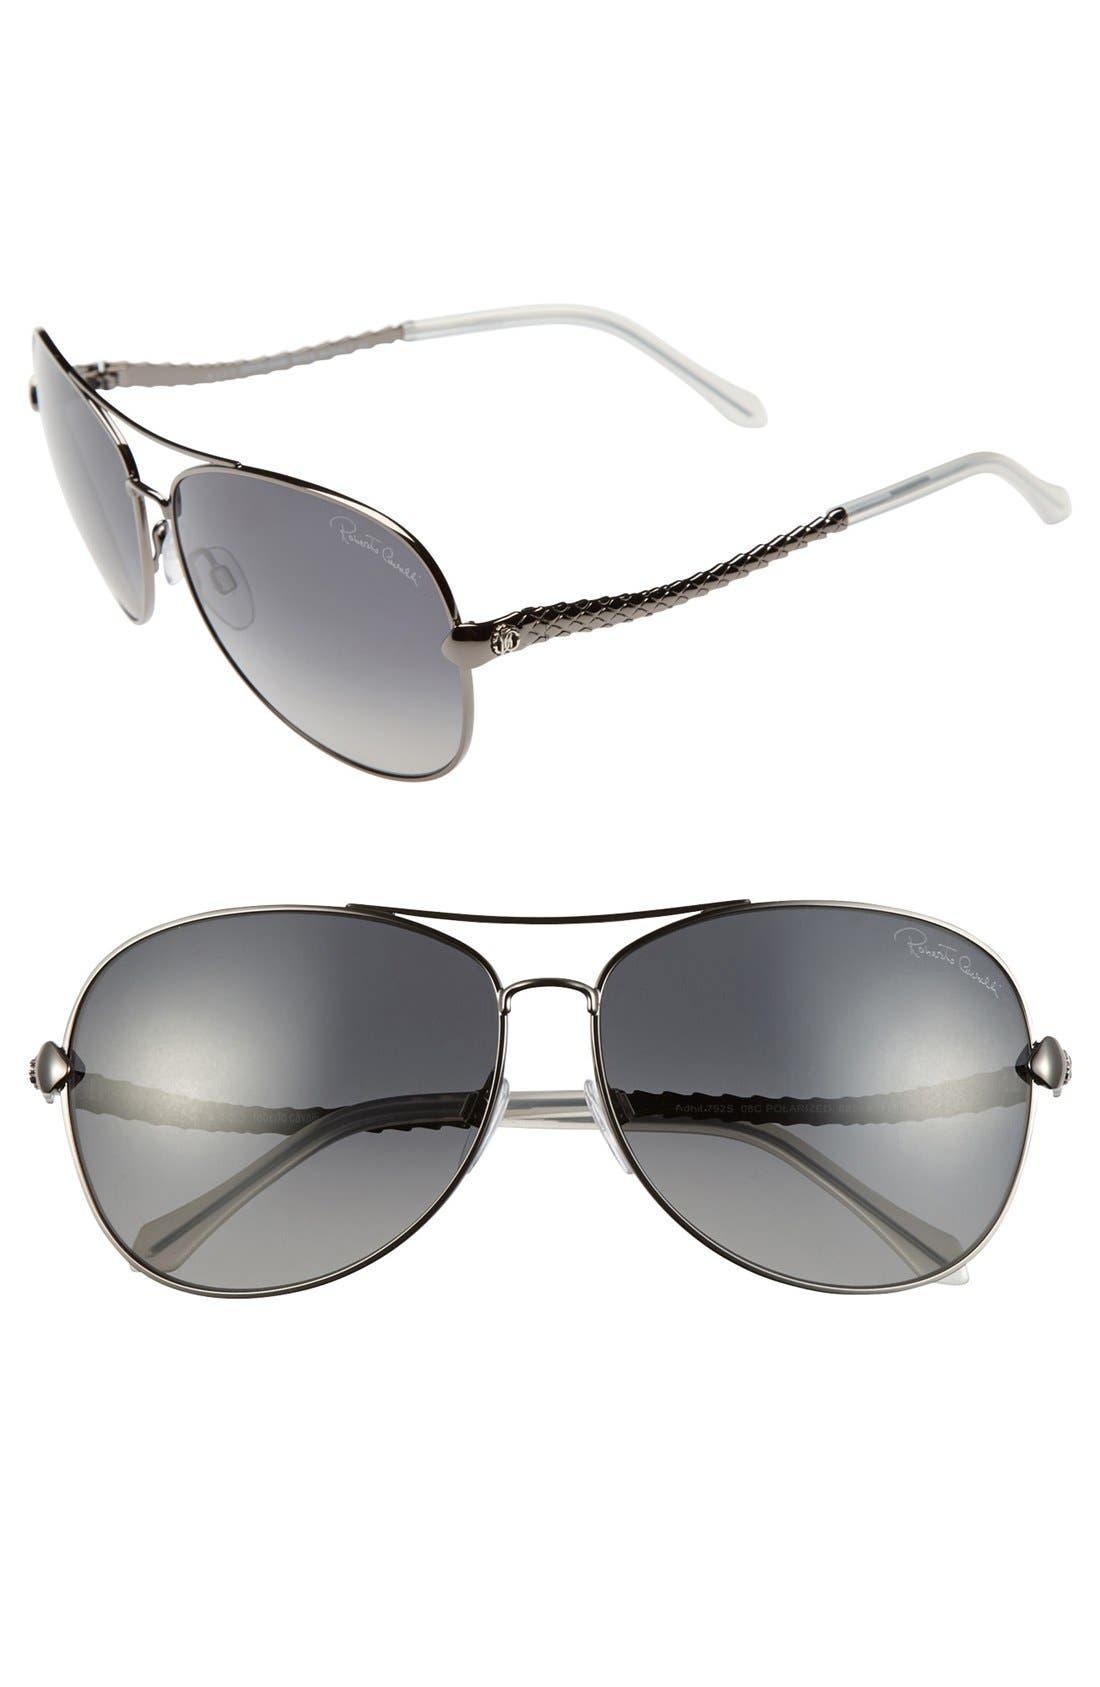 Alternate Image 1 Selected - Roberto Cavalli 'Adhil' 62mm Polarized Aviator Sunglasses